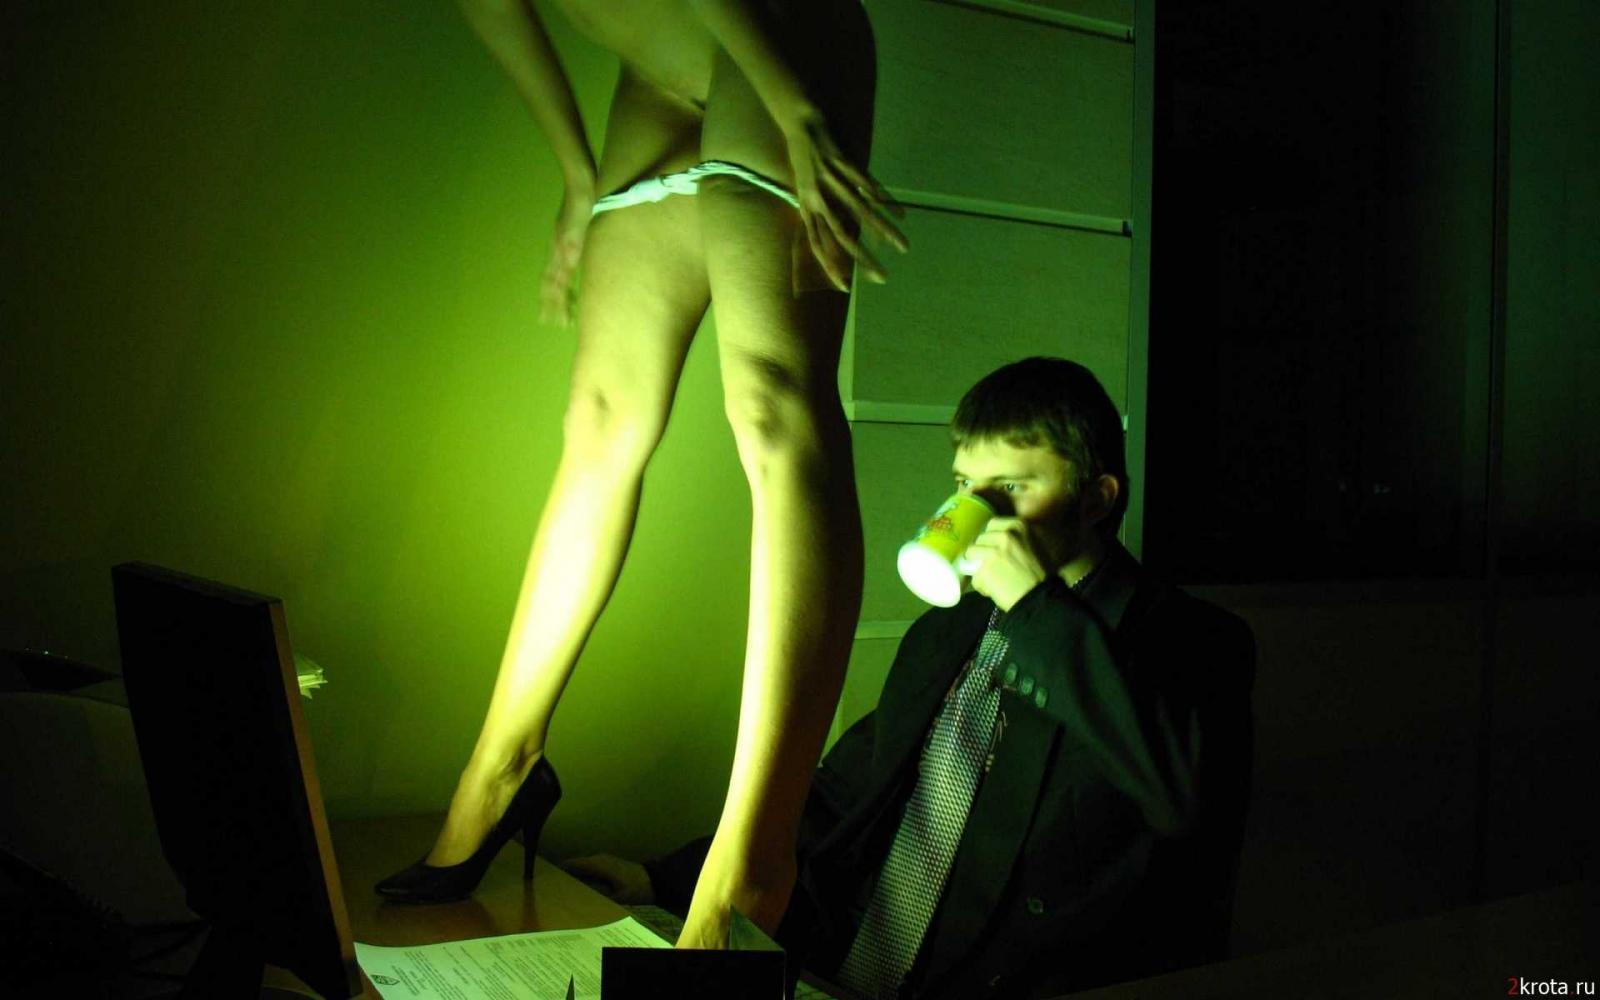 film-pro-porno-vecherinki-russkiy